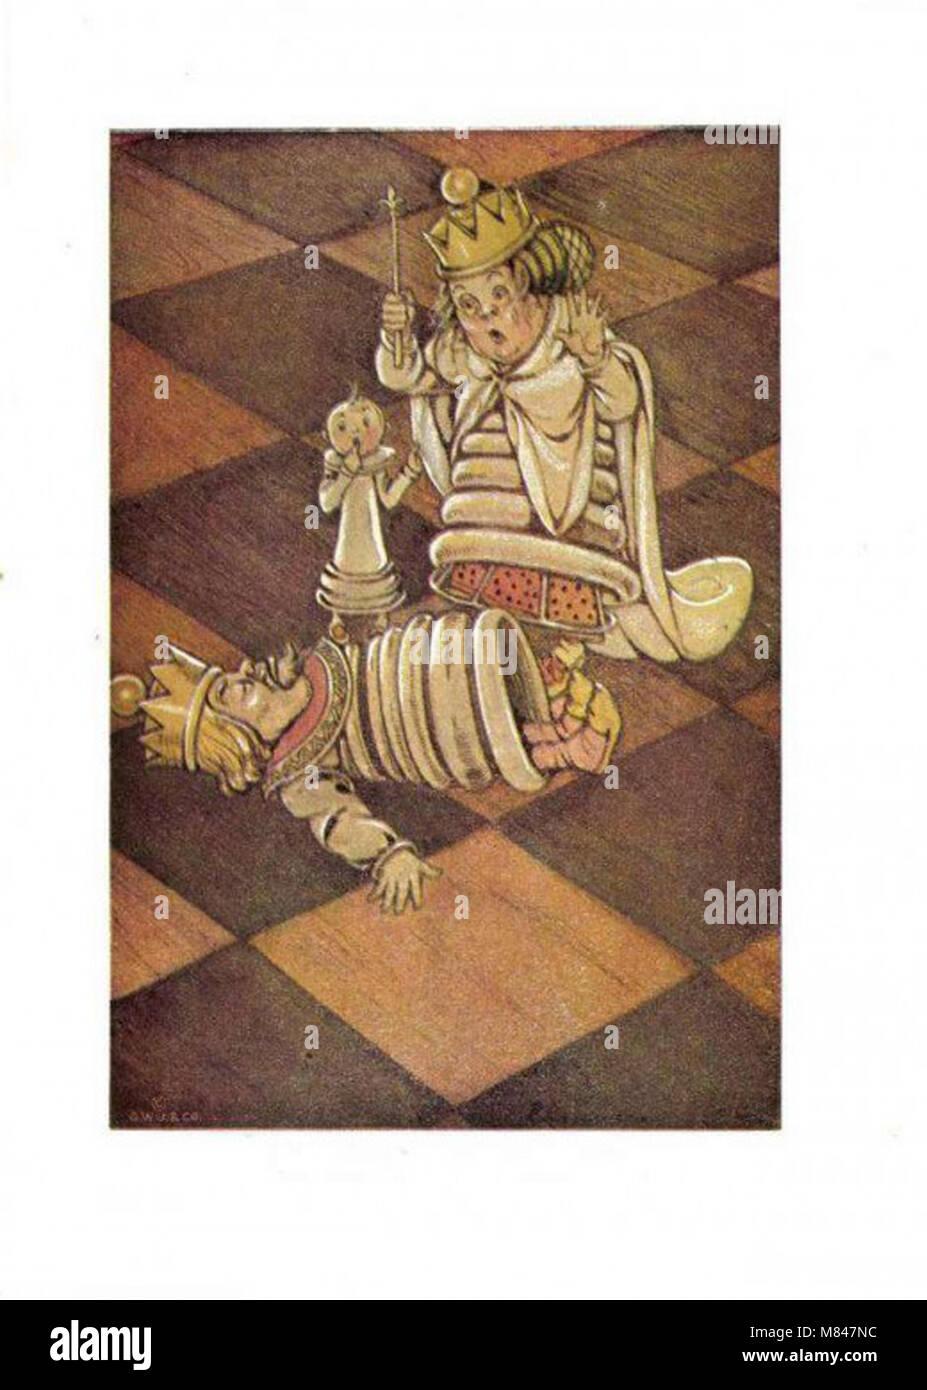 Elenore Plaisted Abbot vintage illustration - Stock Image